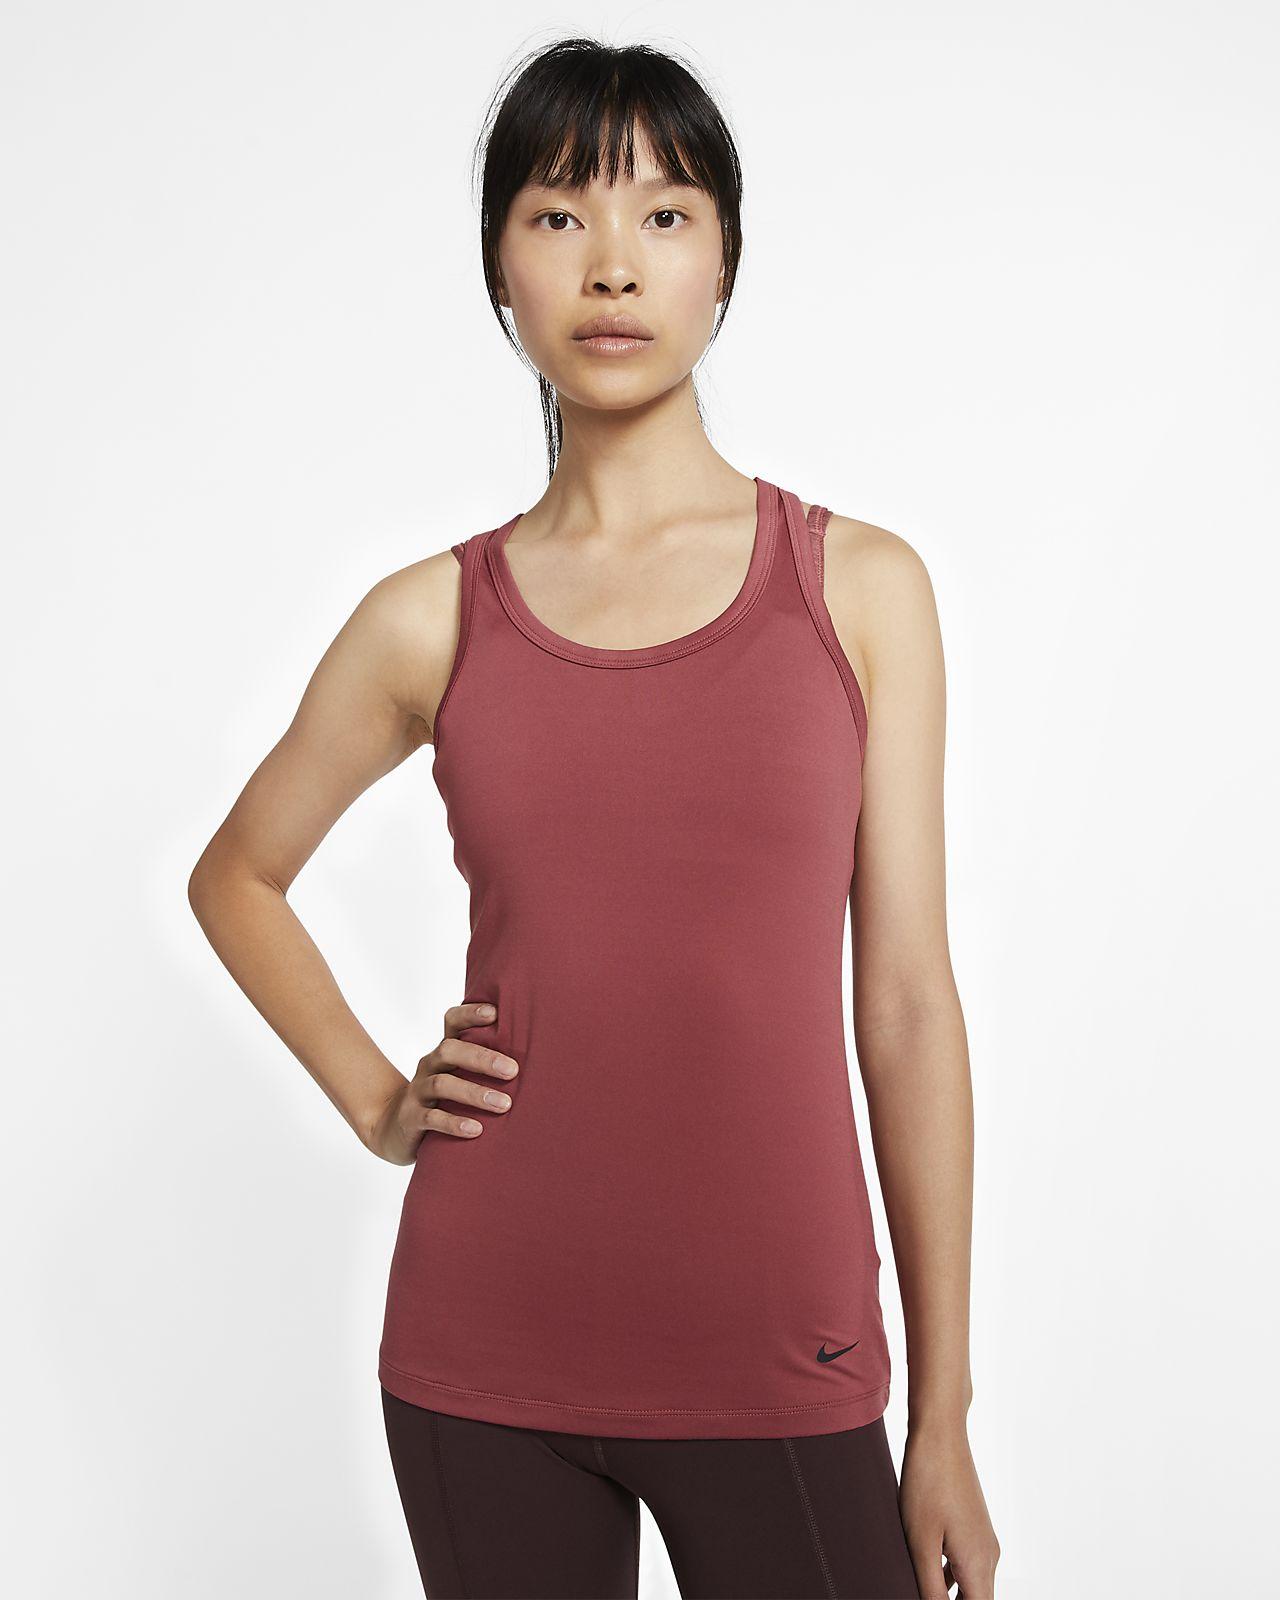 Nike Get Fit Women's Yoga Training Tank